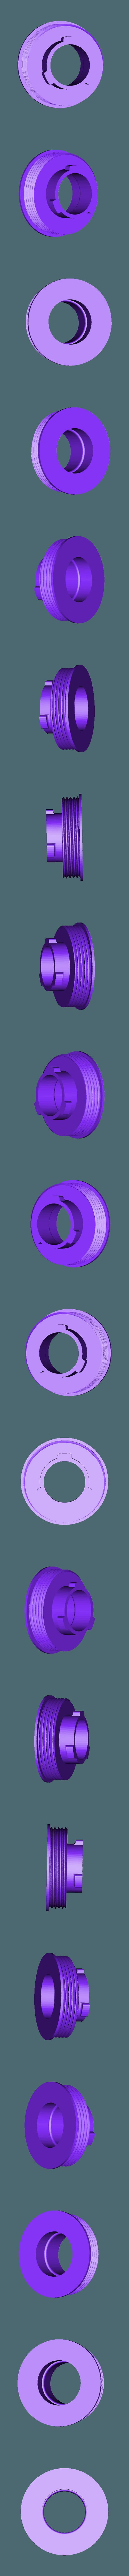 Coupler V3 (P1).stl Download free STL file  VMO MASK V3 - 3D-PRINTED PROTECTIVE- Coronavirus COVID-19 (Improved Version) • Model to 3D print, victorottati